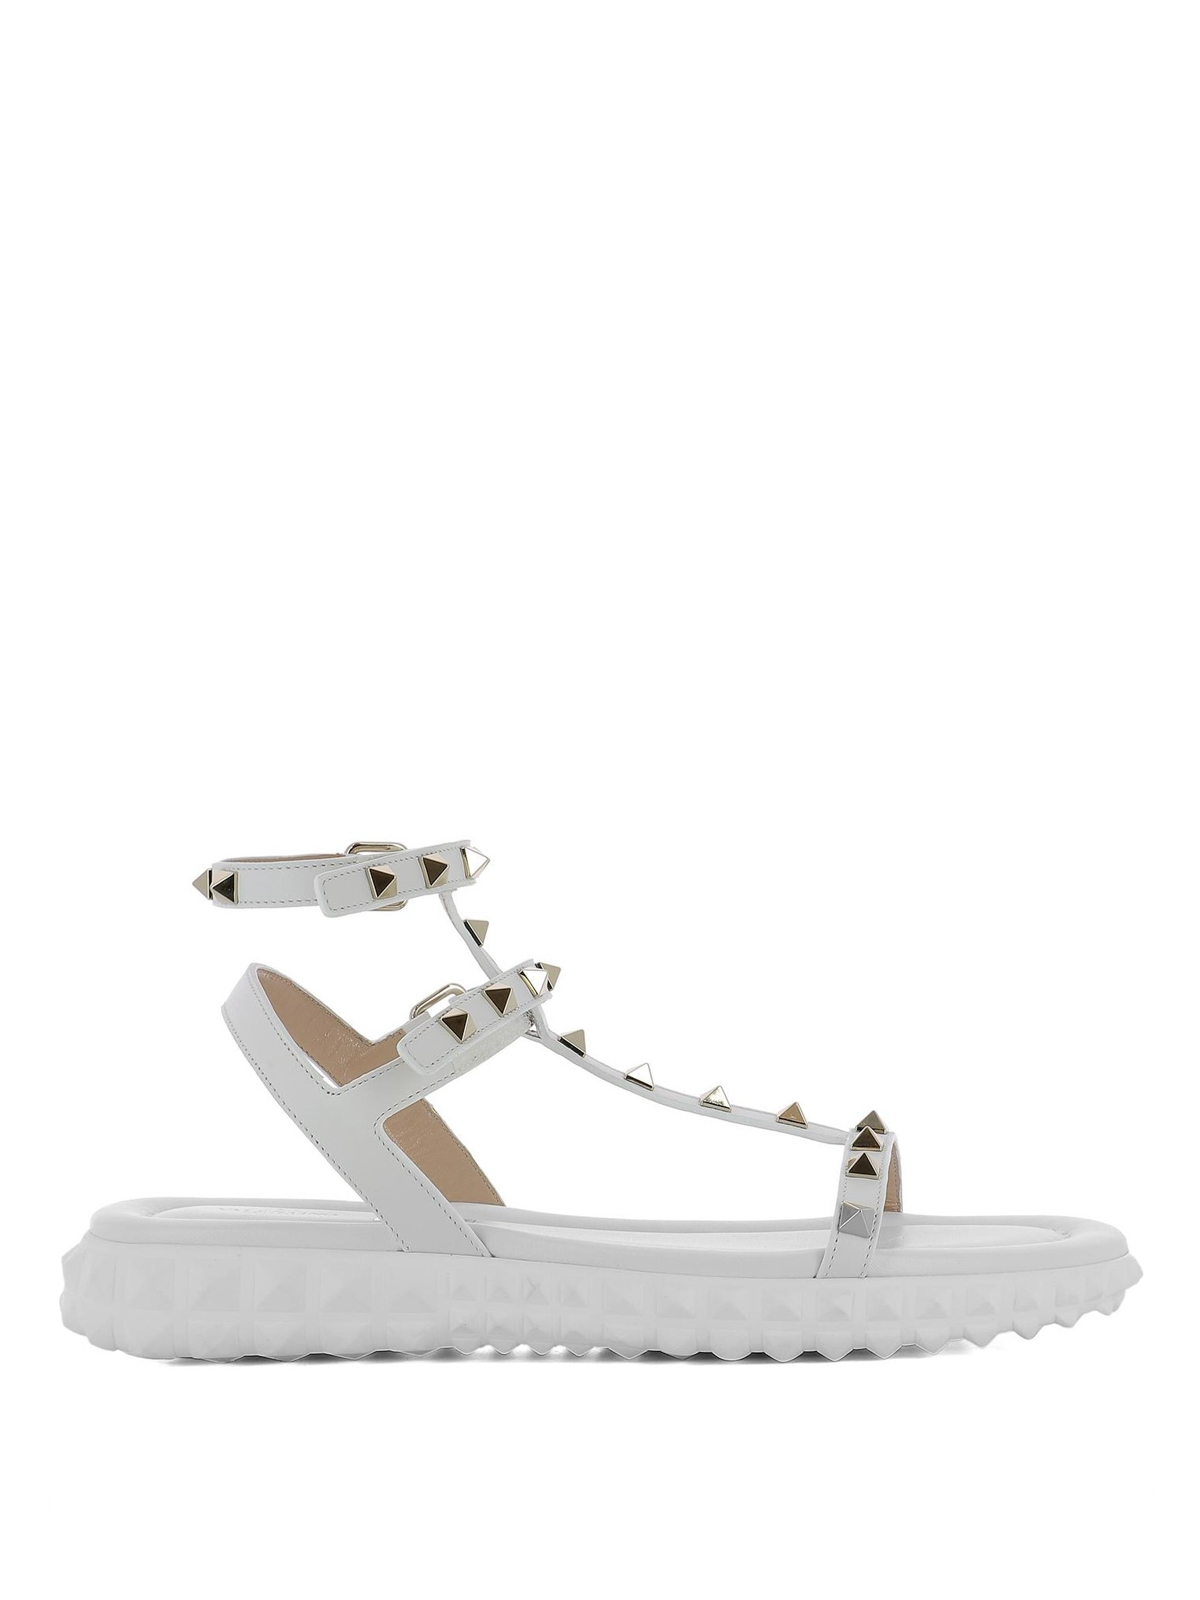 65a2838c2ed Valentino Garavani - Rockstud T-straps wedge sandals - sandals ...